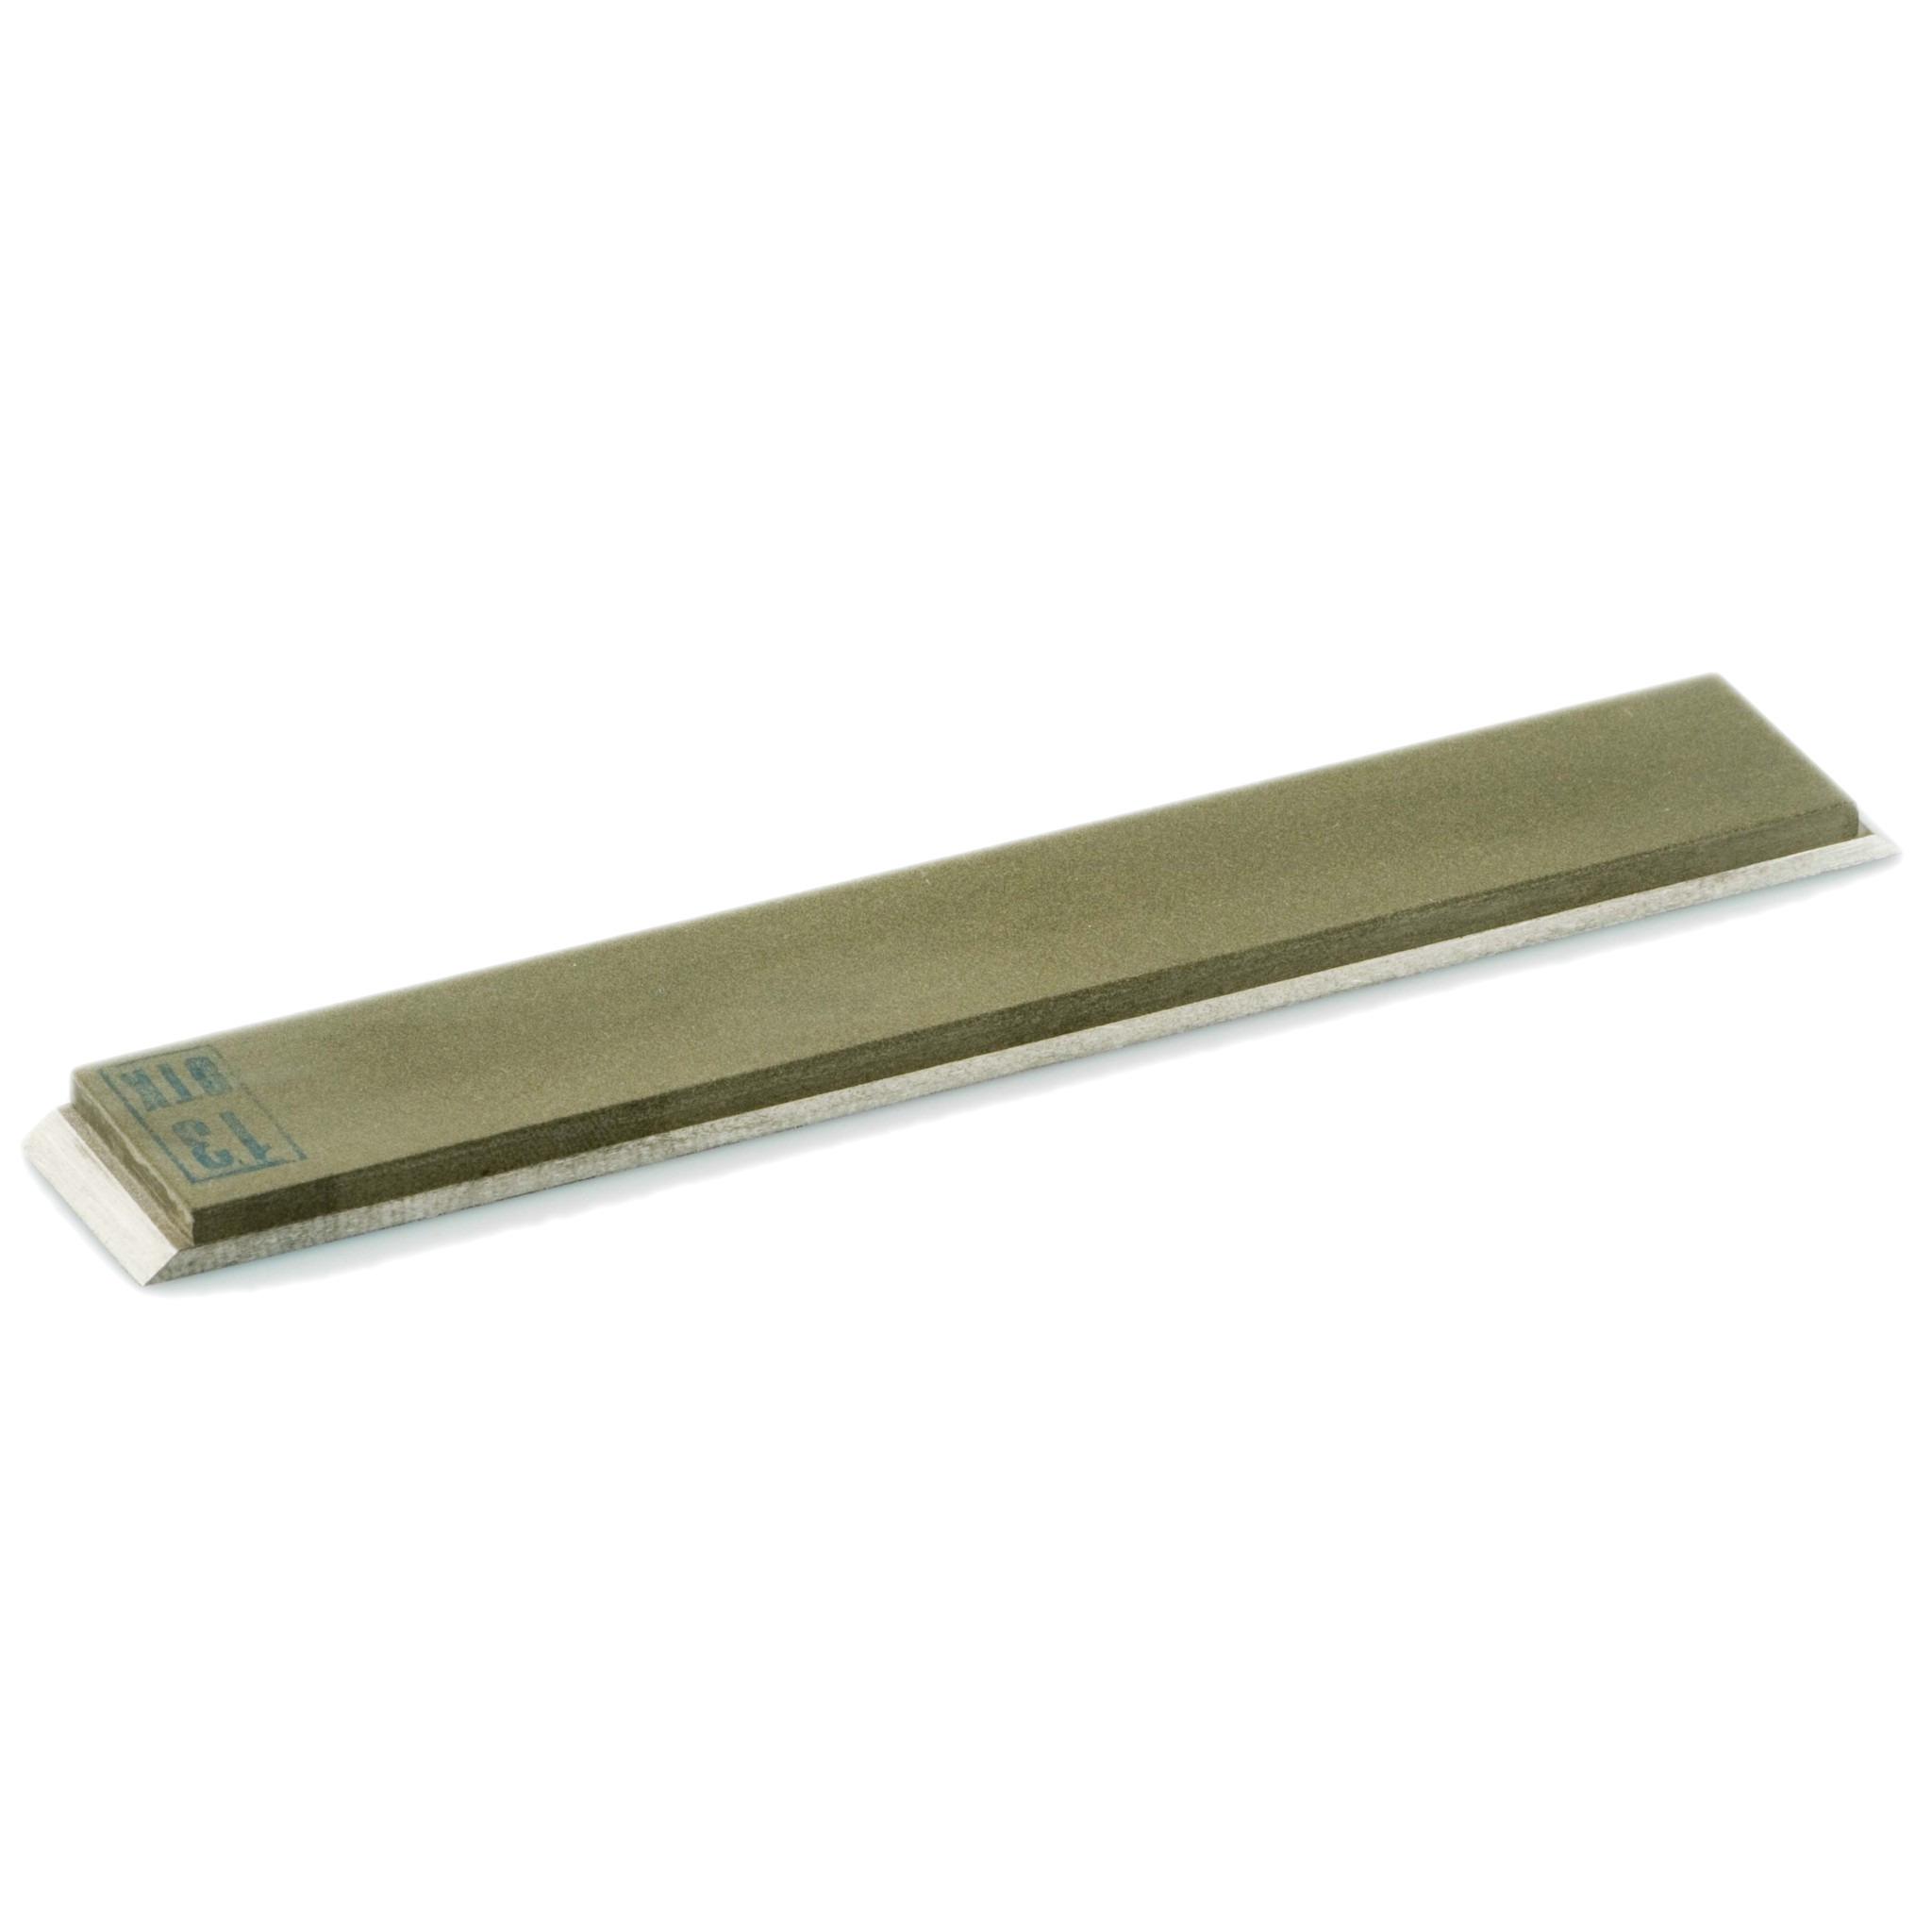 150х25х6 мм для Apex Edge Pro, ЖУК Алмазный брусок 150х25х6 7/5 25% Белый.jpg